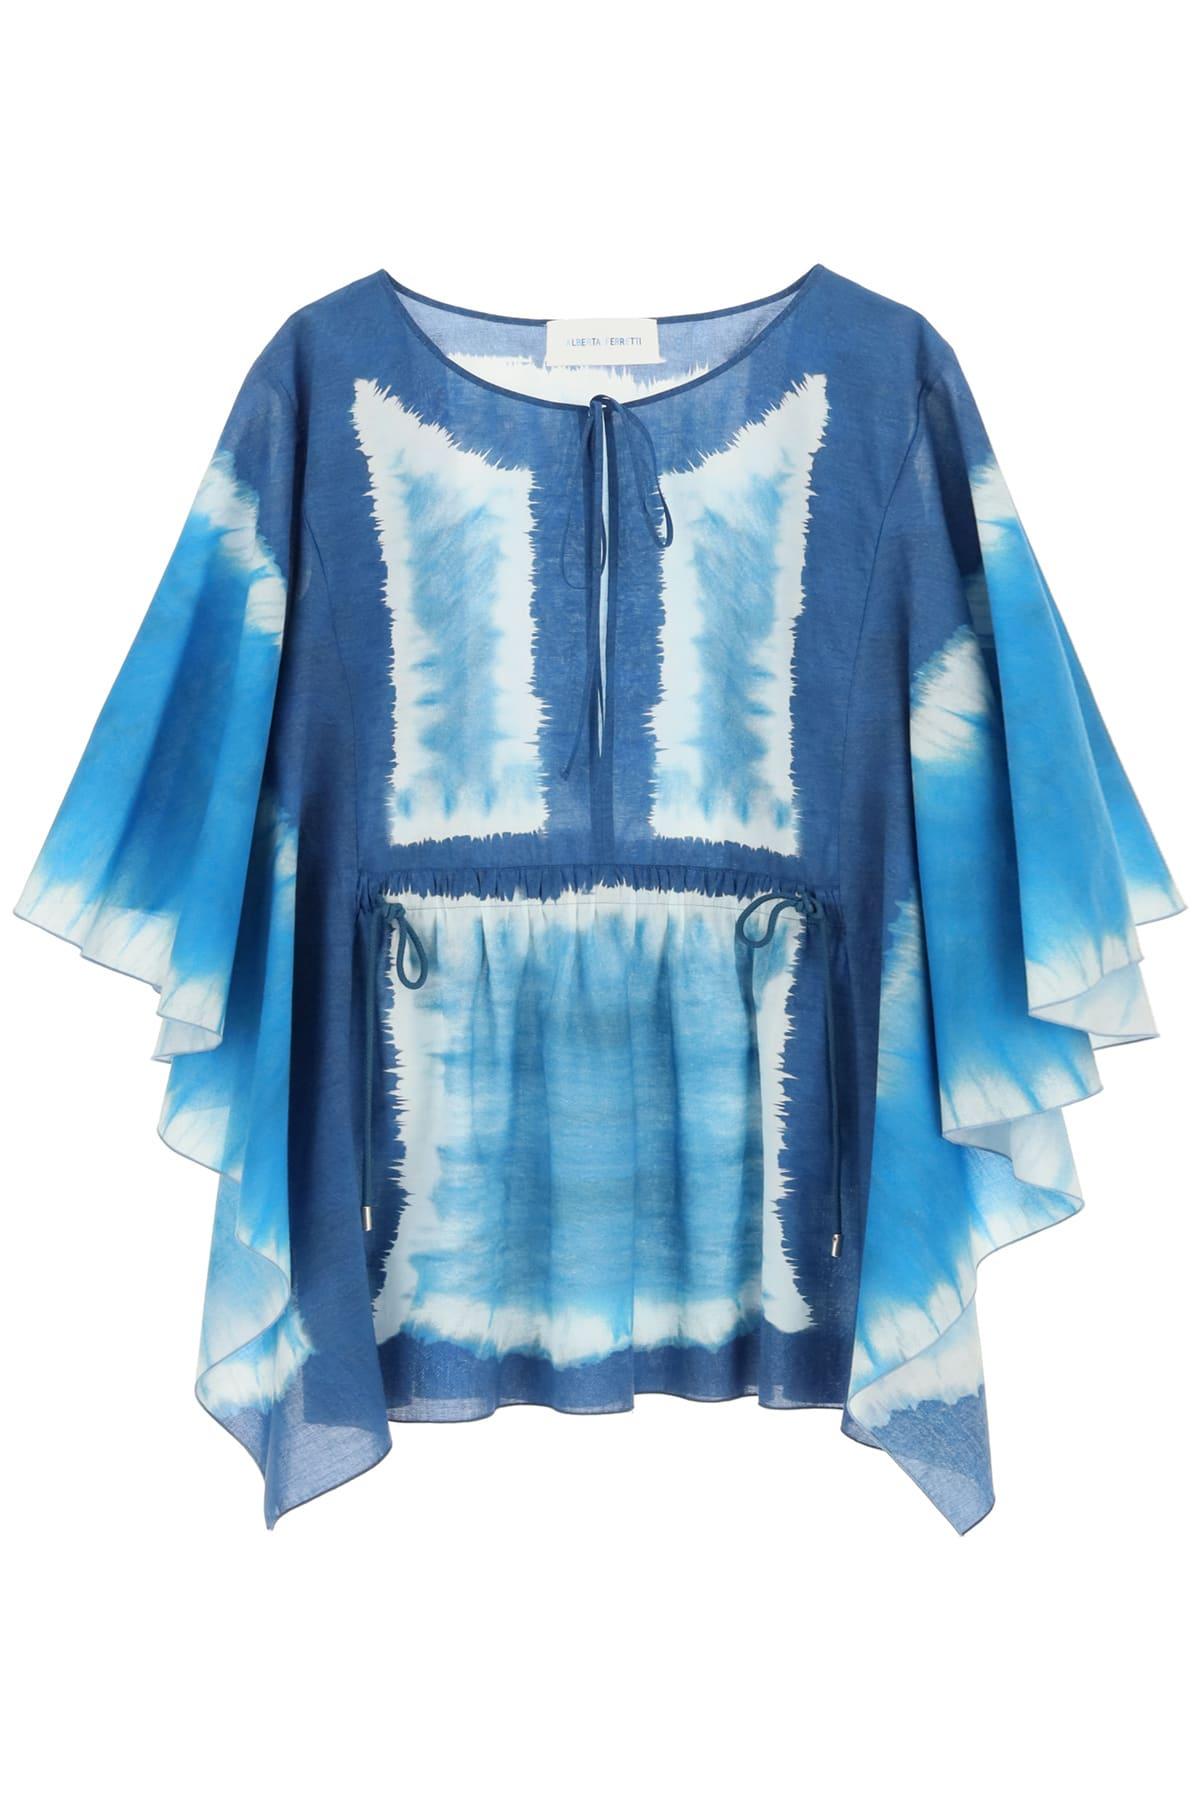 Alberta Ferretti Cottons I LOVE SUMMER TIE-DYE CAFTAN DRESS